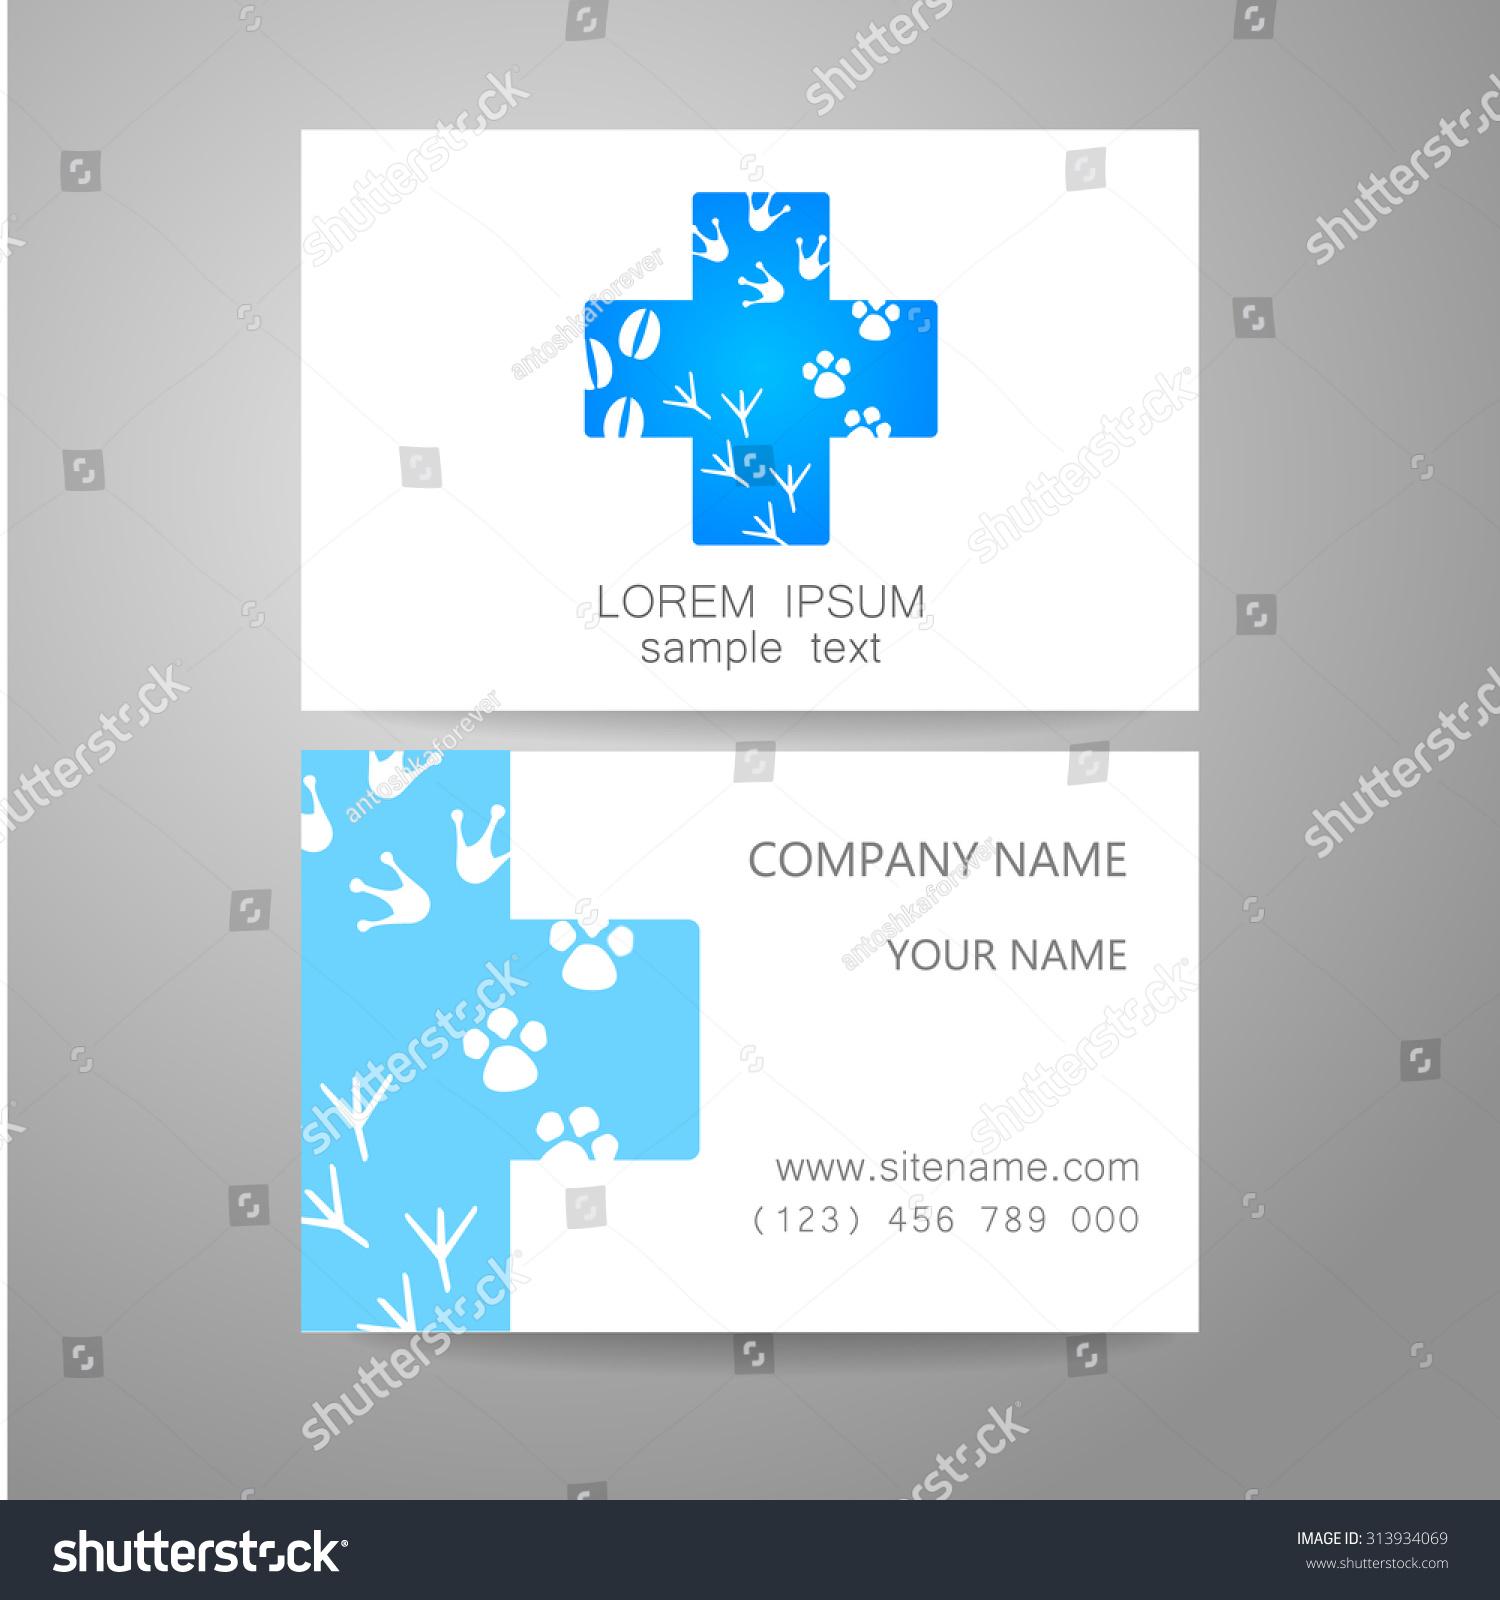 veterinary template logo idea logo veterinary stock vector 313934069 shutterstock. Black Bedroom Furniture Sets. Home Design Ideas